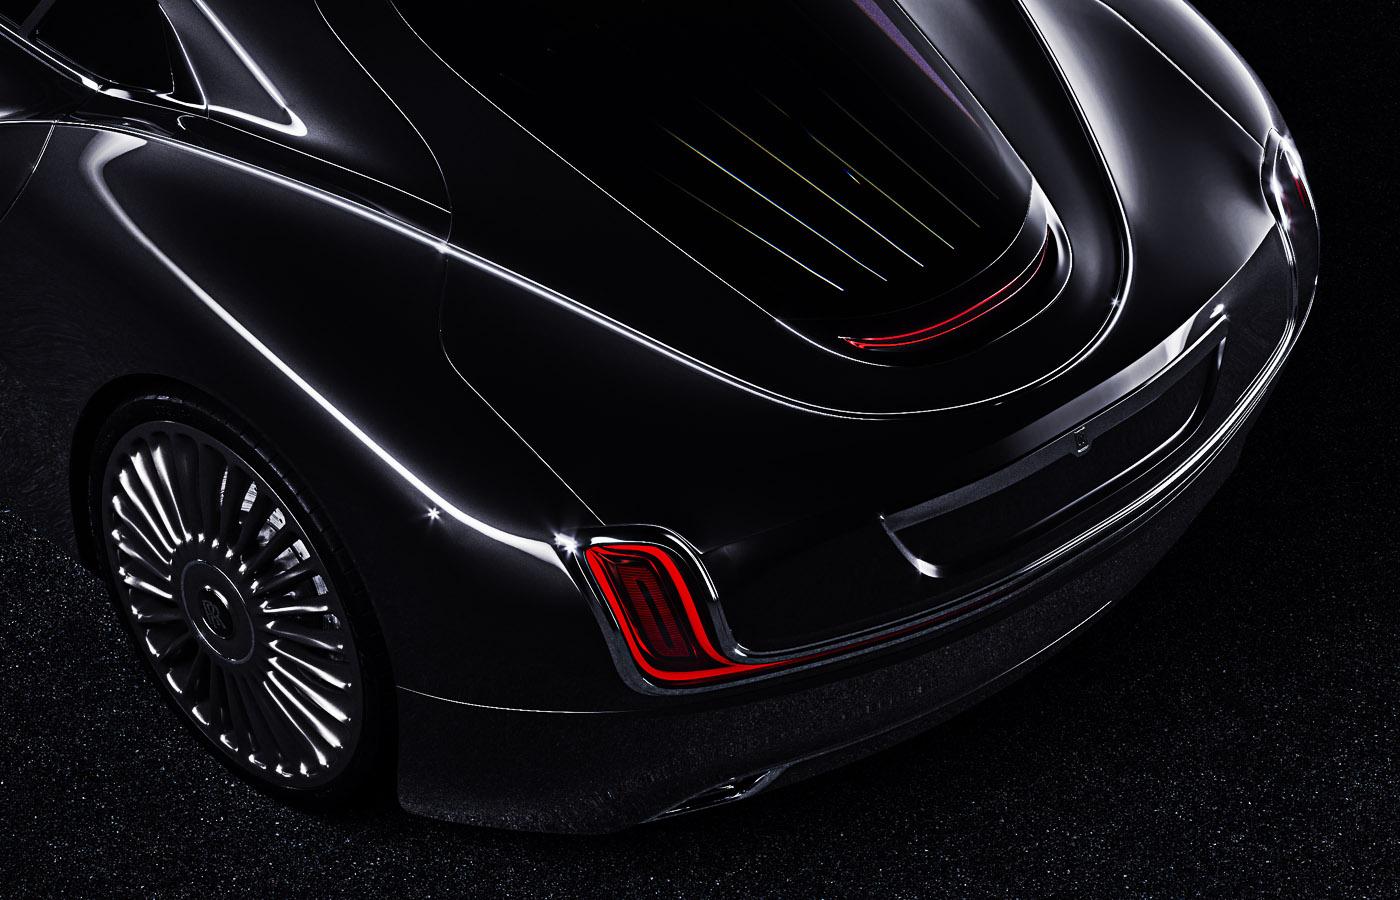 Rolls Royce luxury automotive design 10.jpg